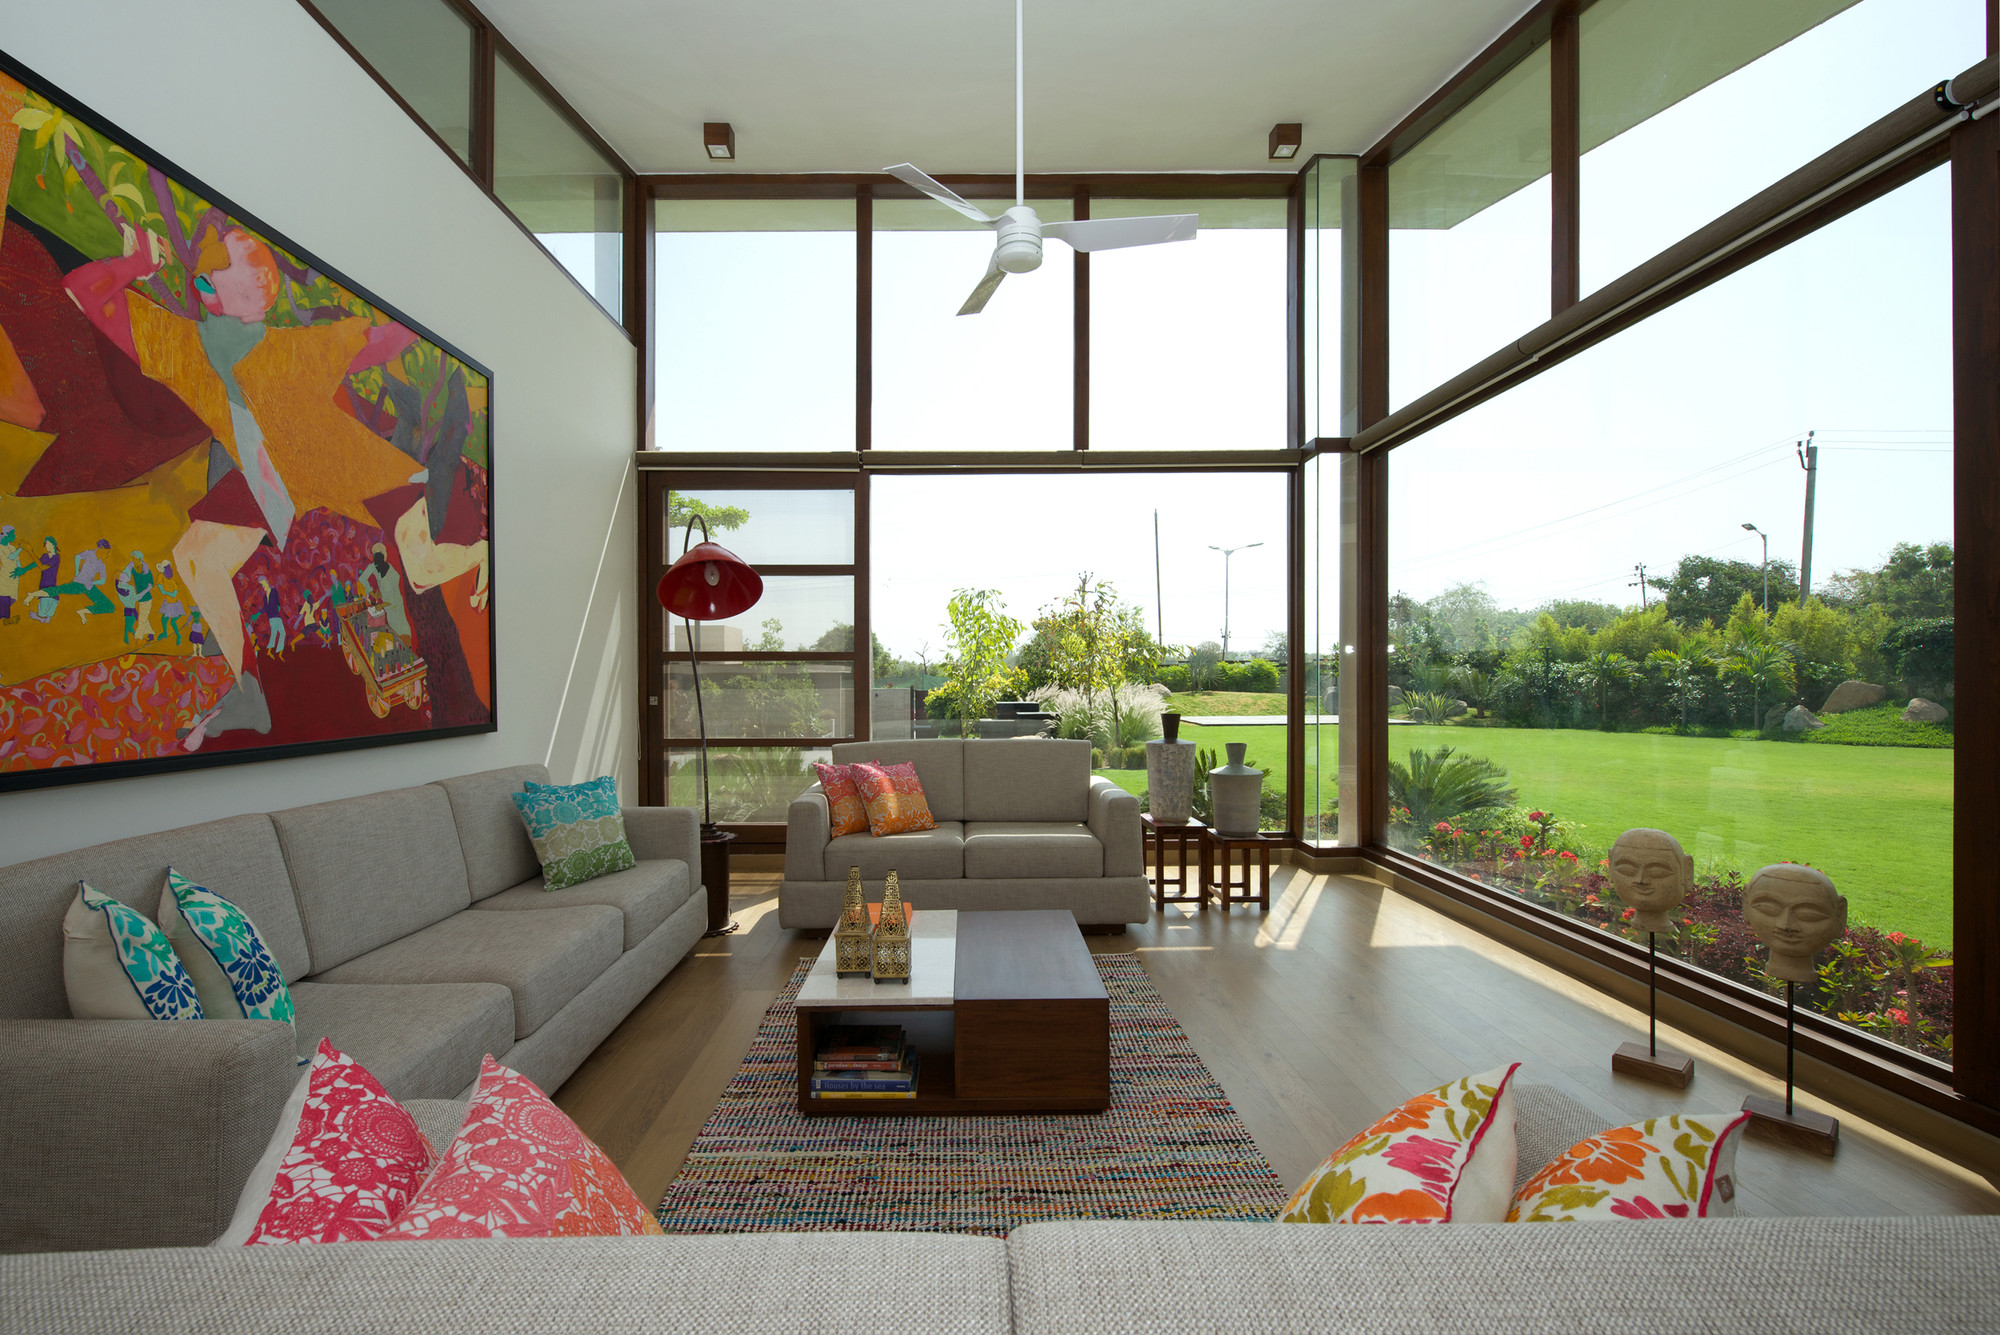 The Urbane House Hiren Patel Architects on Family Room Kitchen Open Floor Plan